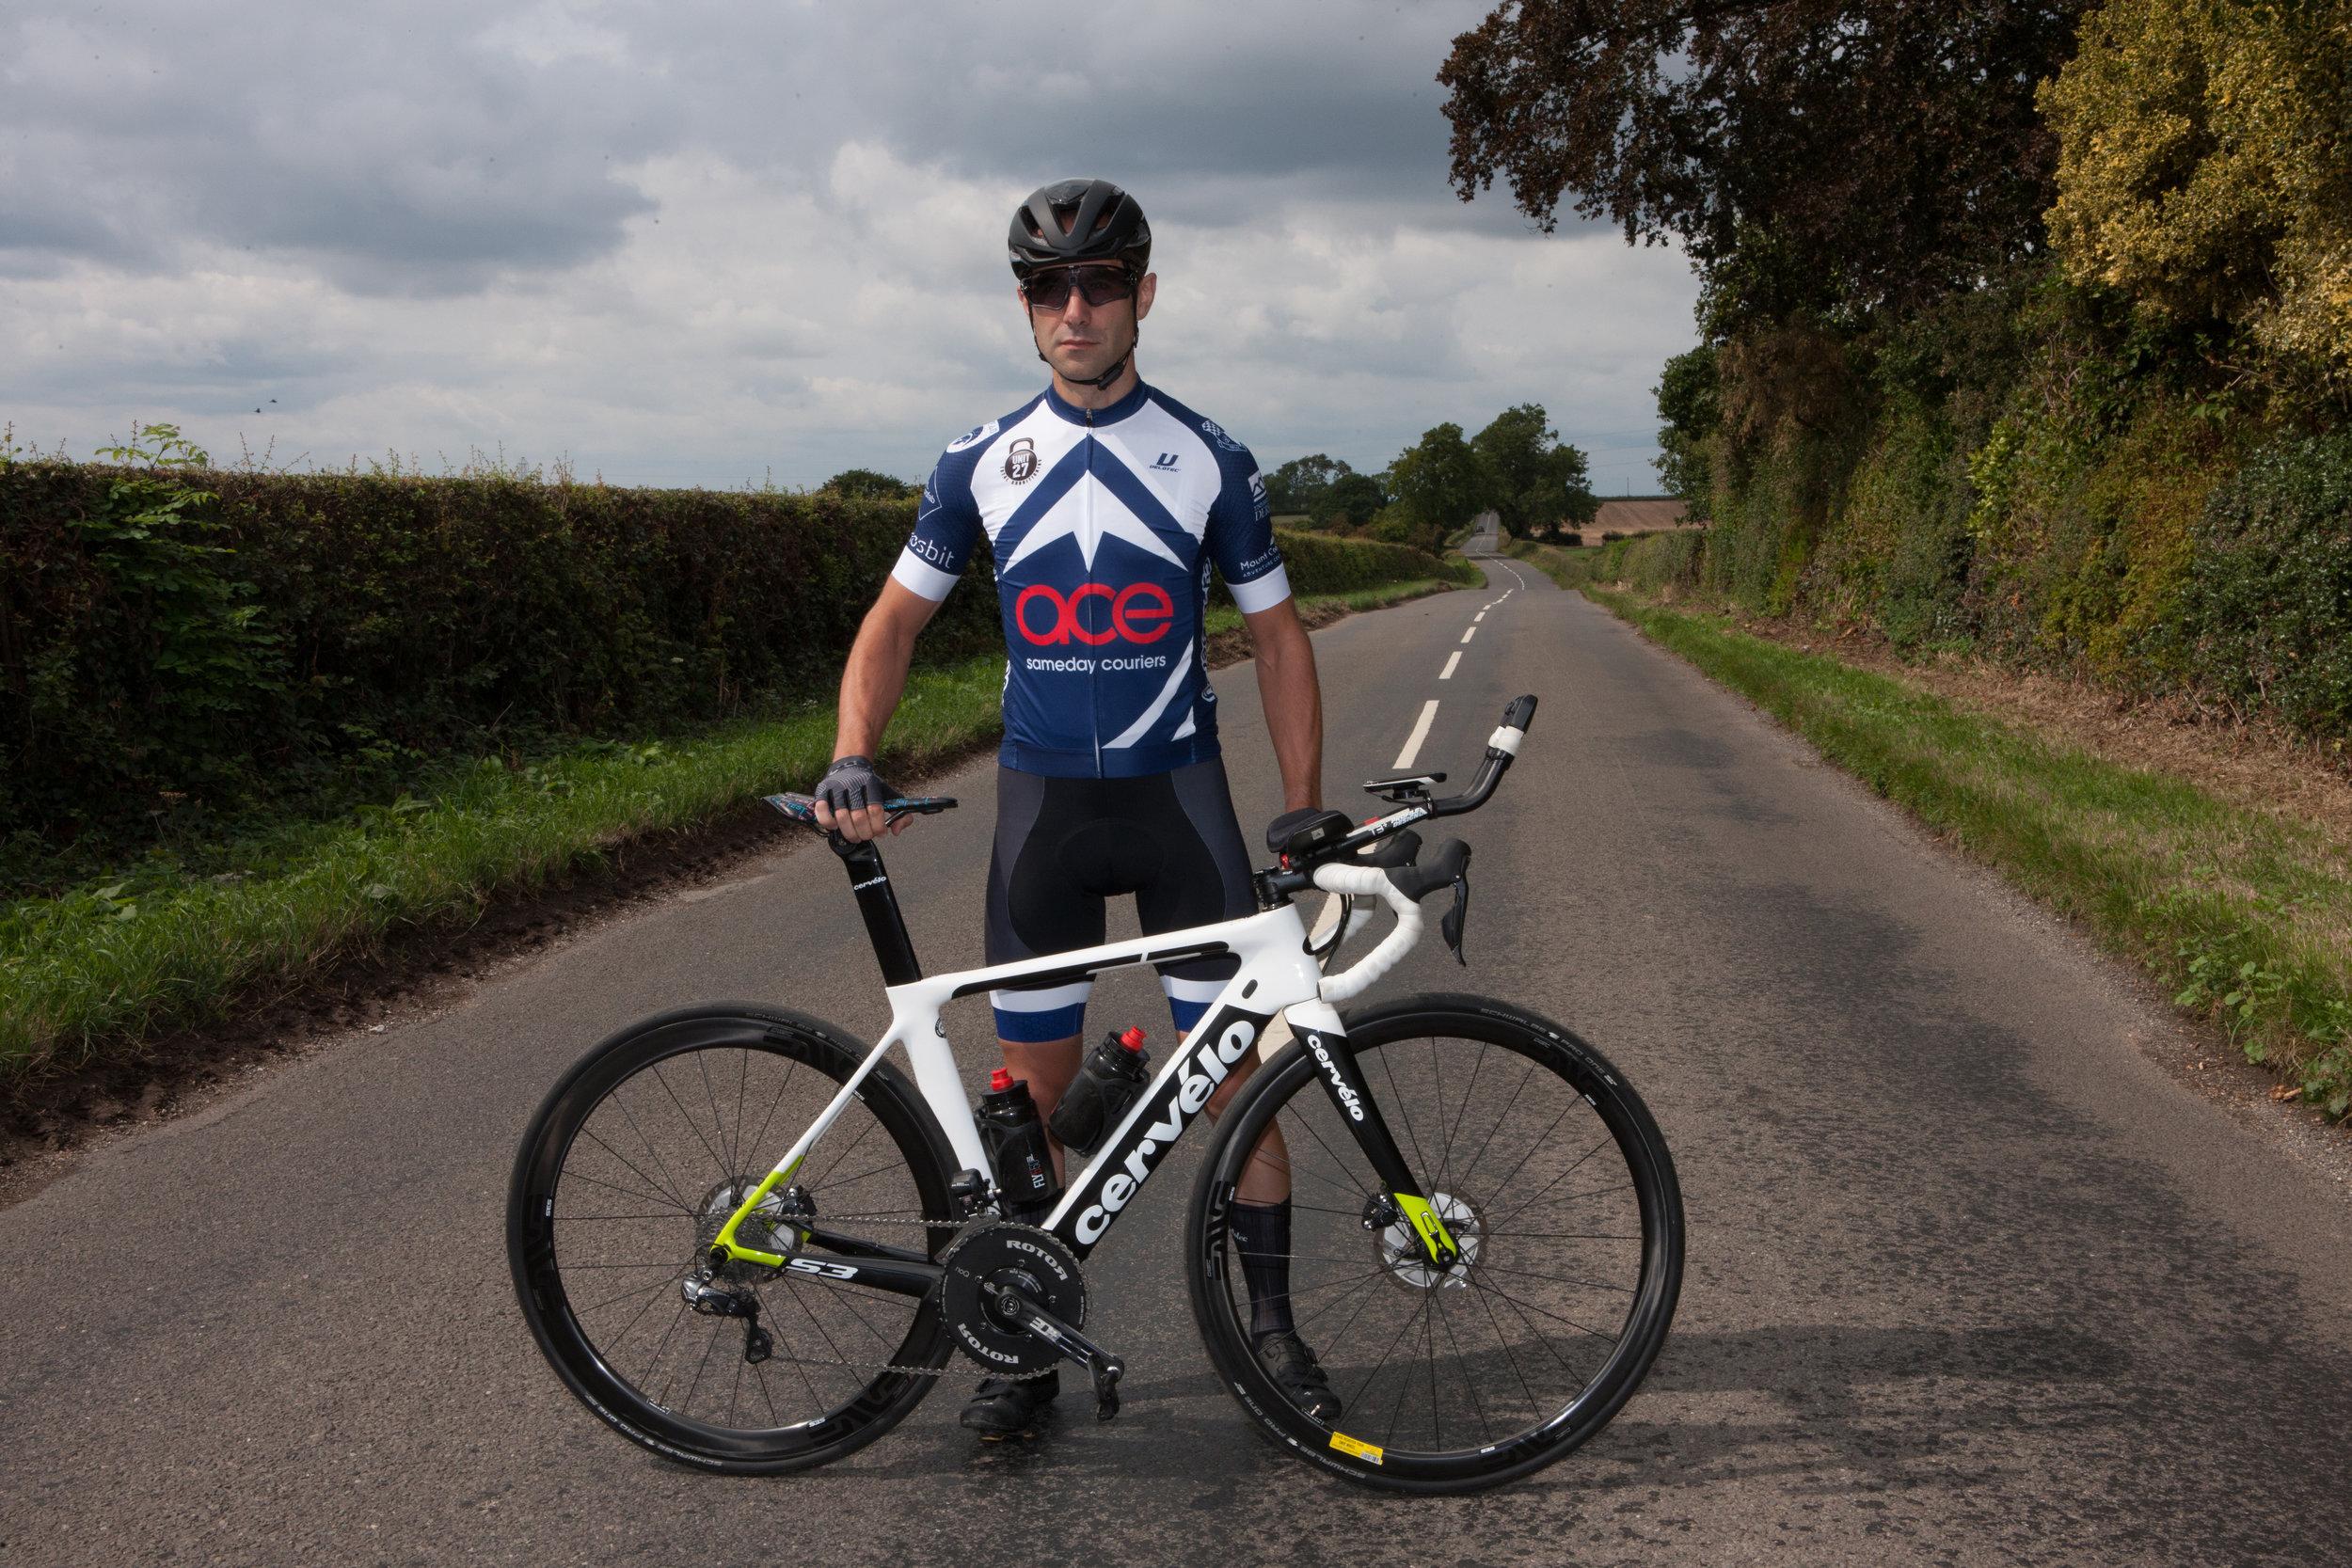 Timmis_Europe_Cycle_Record.jpg